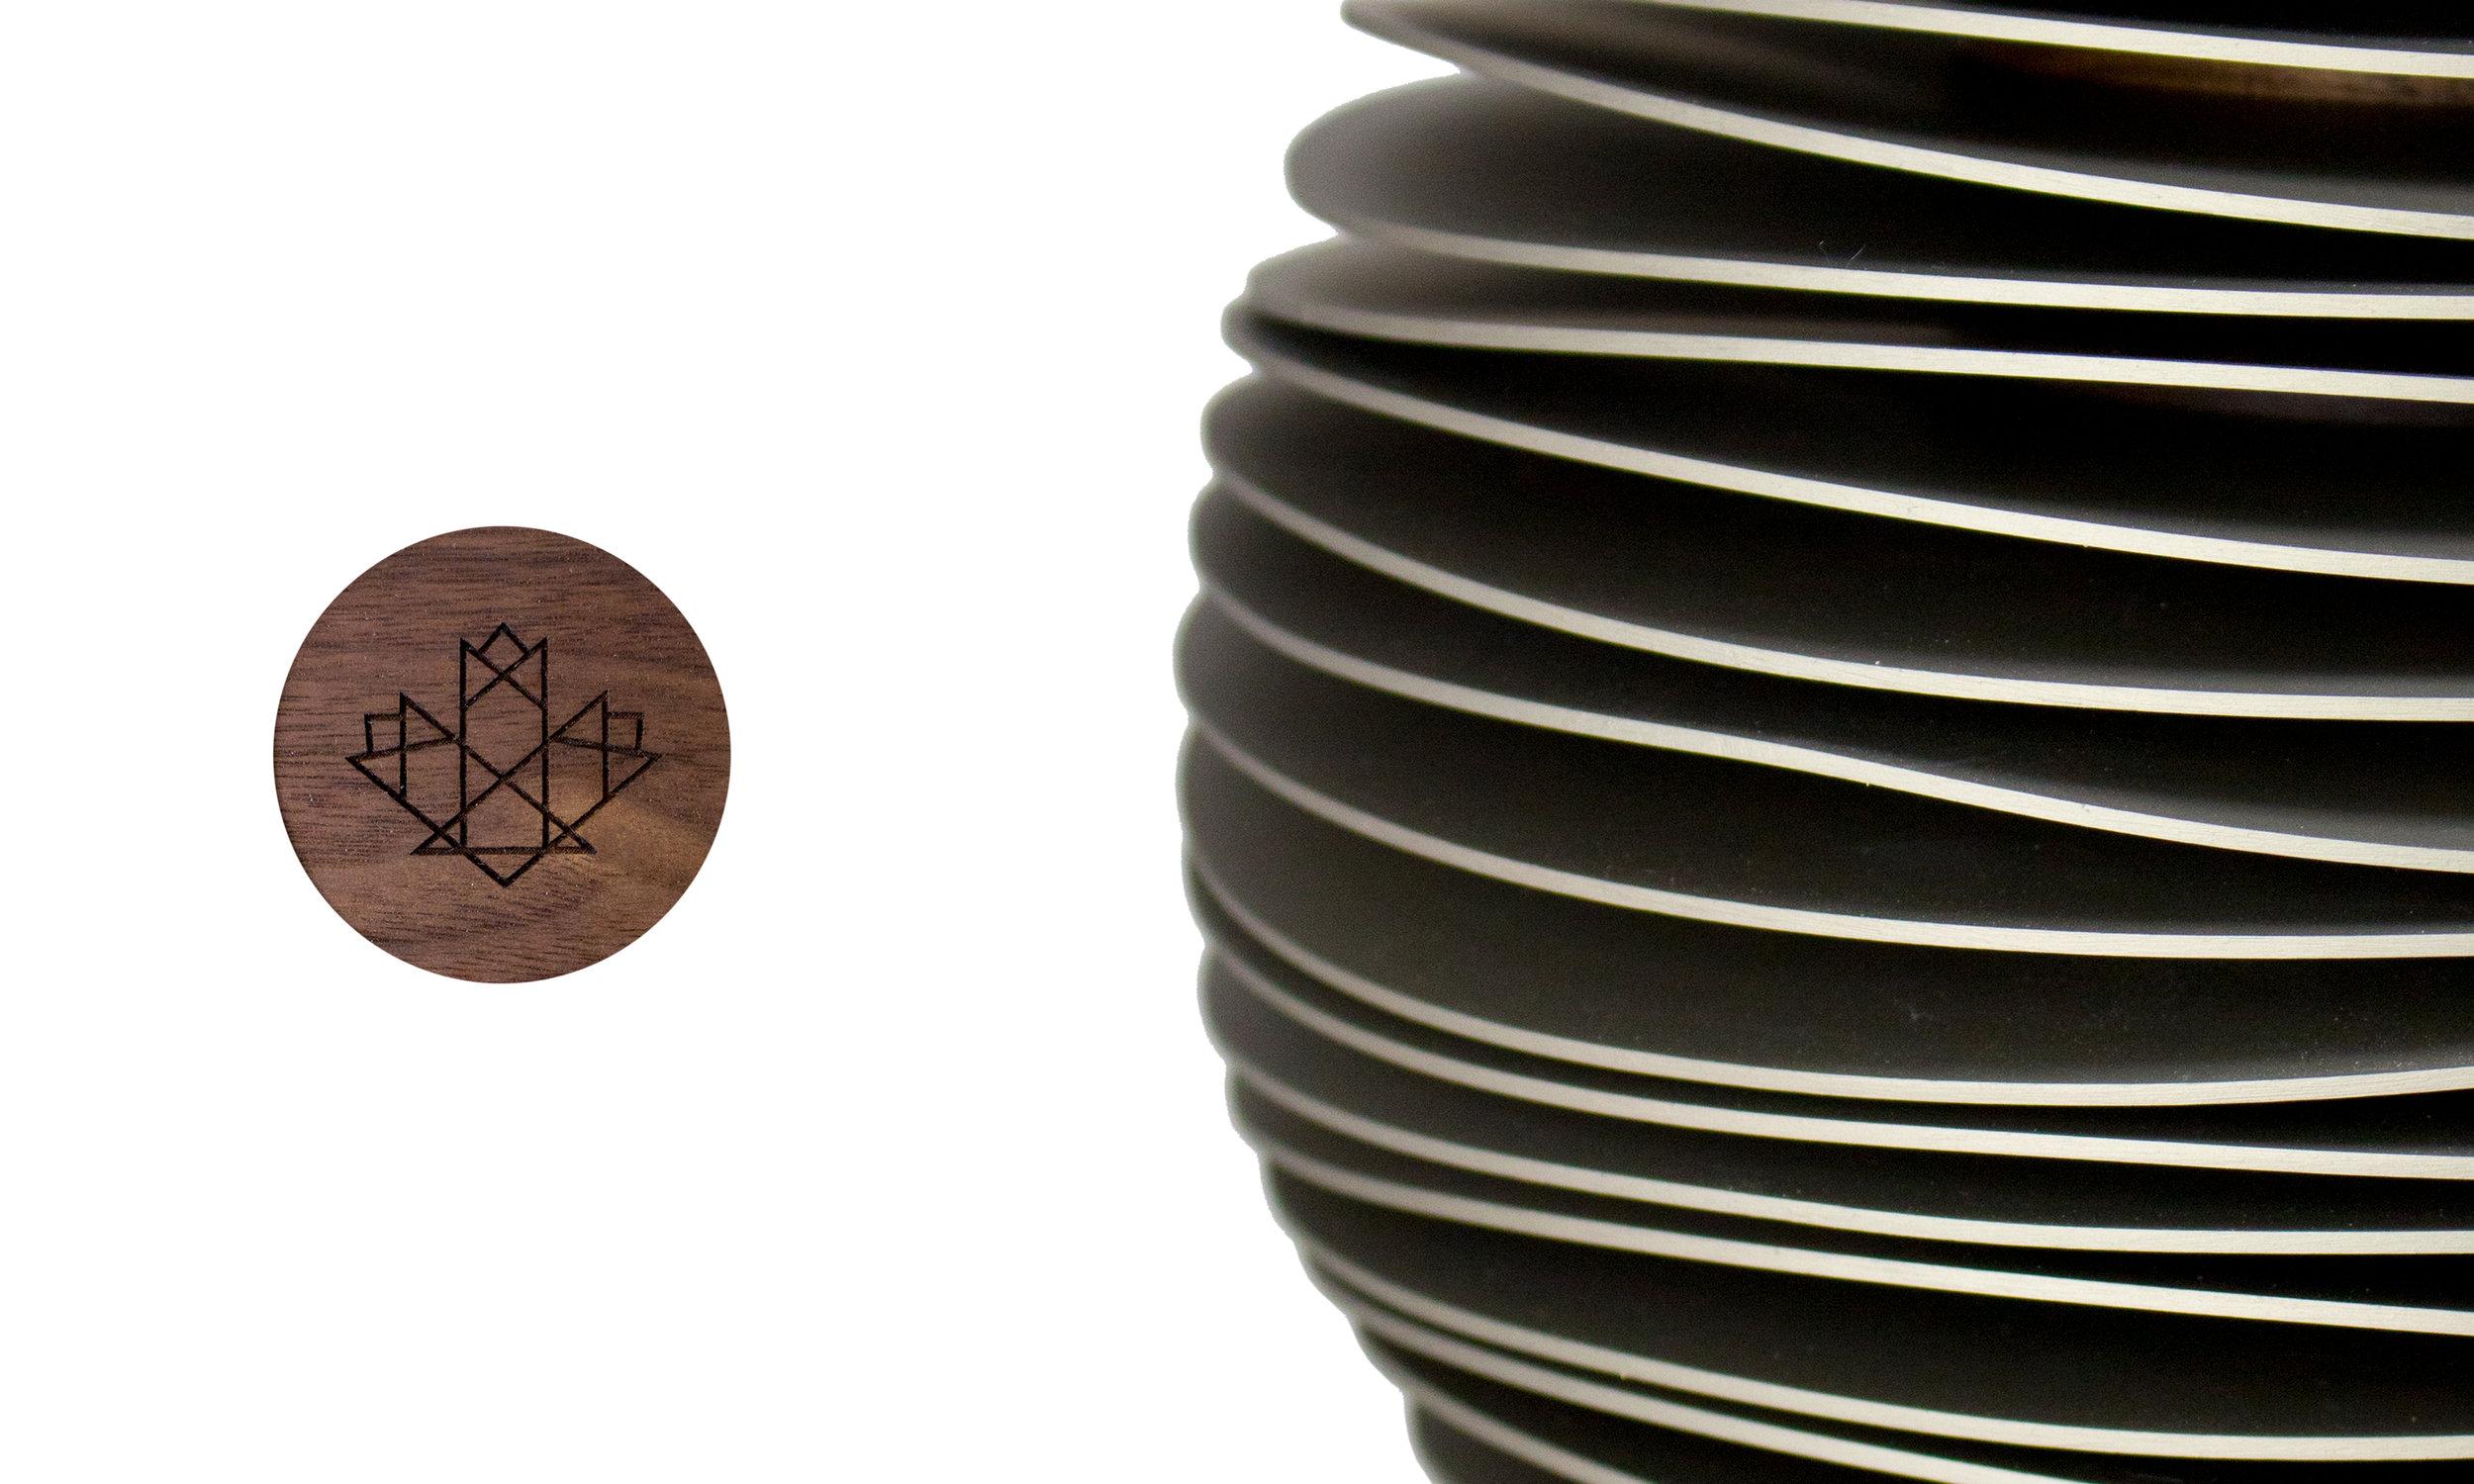 mining hall of fame awards corporate recognition modern walnut hardwood laser engraving